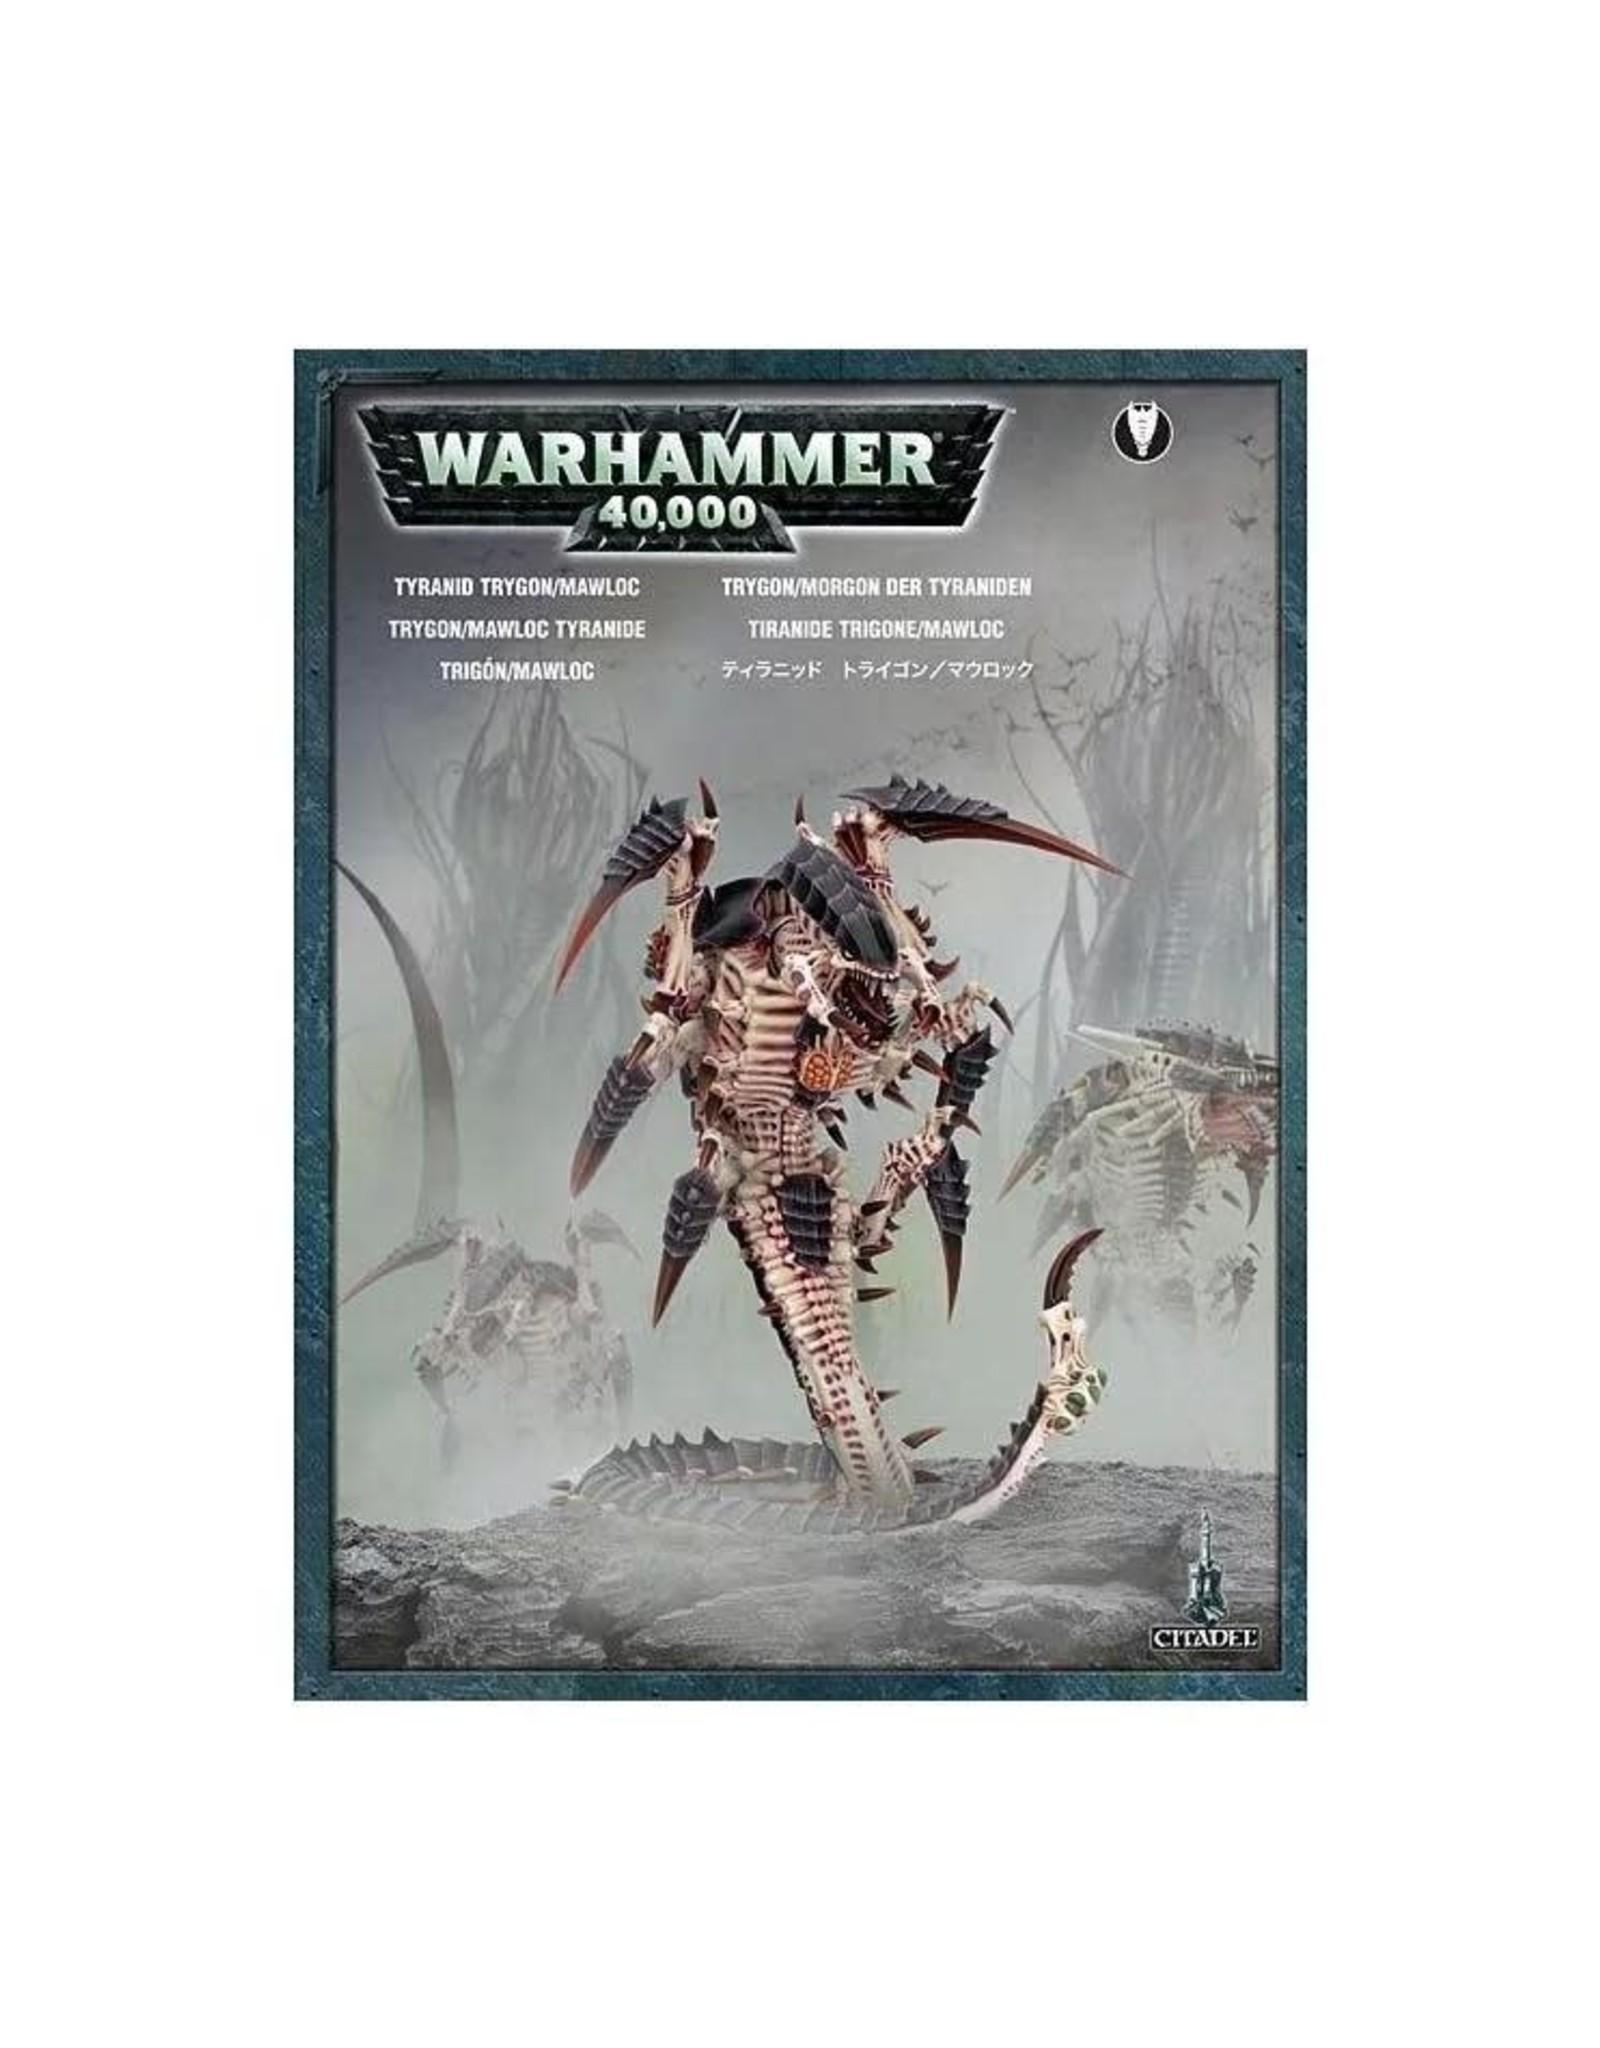 Warhammer 40K Tyranid Trygon / Mawloc